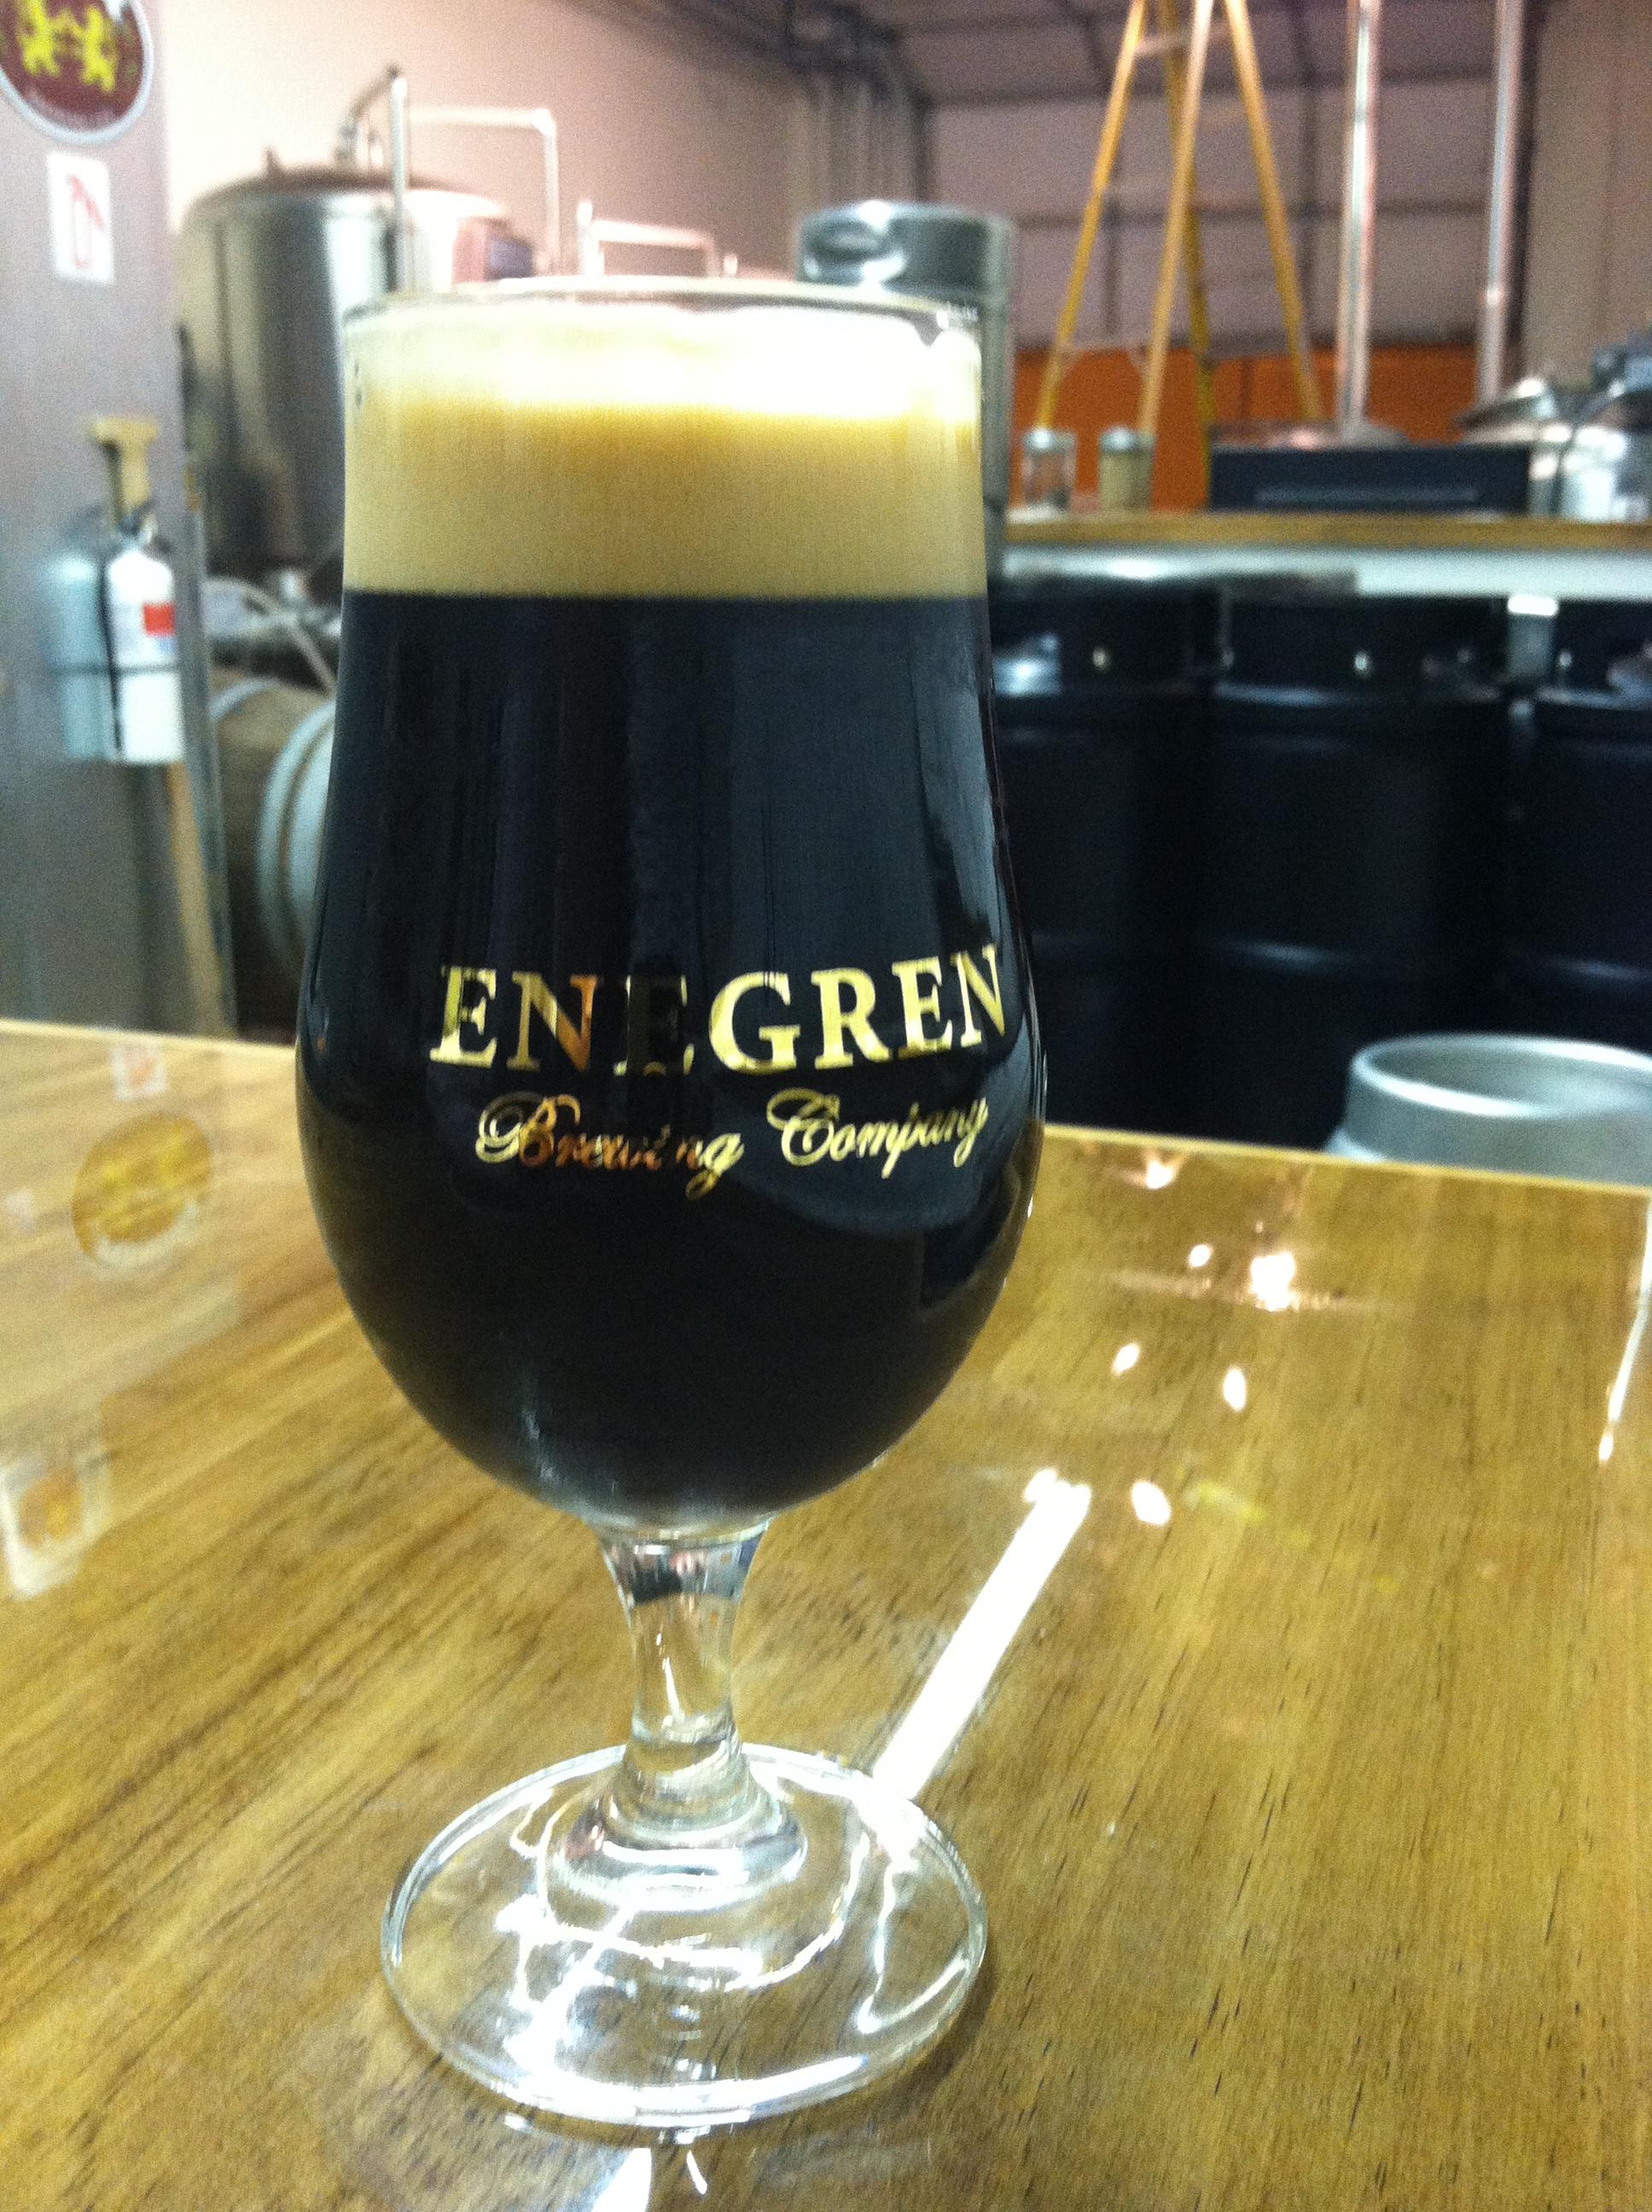 Keep The Glass Day With Daniel Irons Oatmeal Stout Enegren Brewing Energen Oatmilk Mixbry10scx24g In Fancy Beer